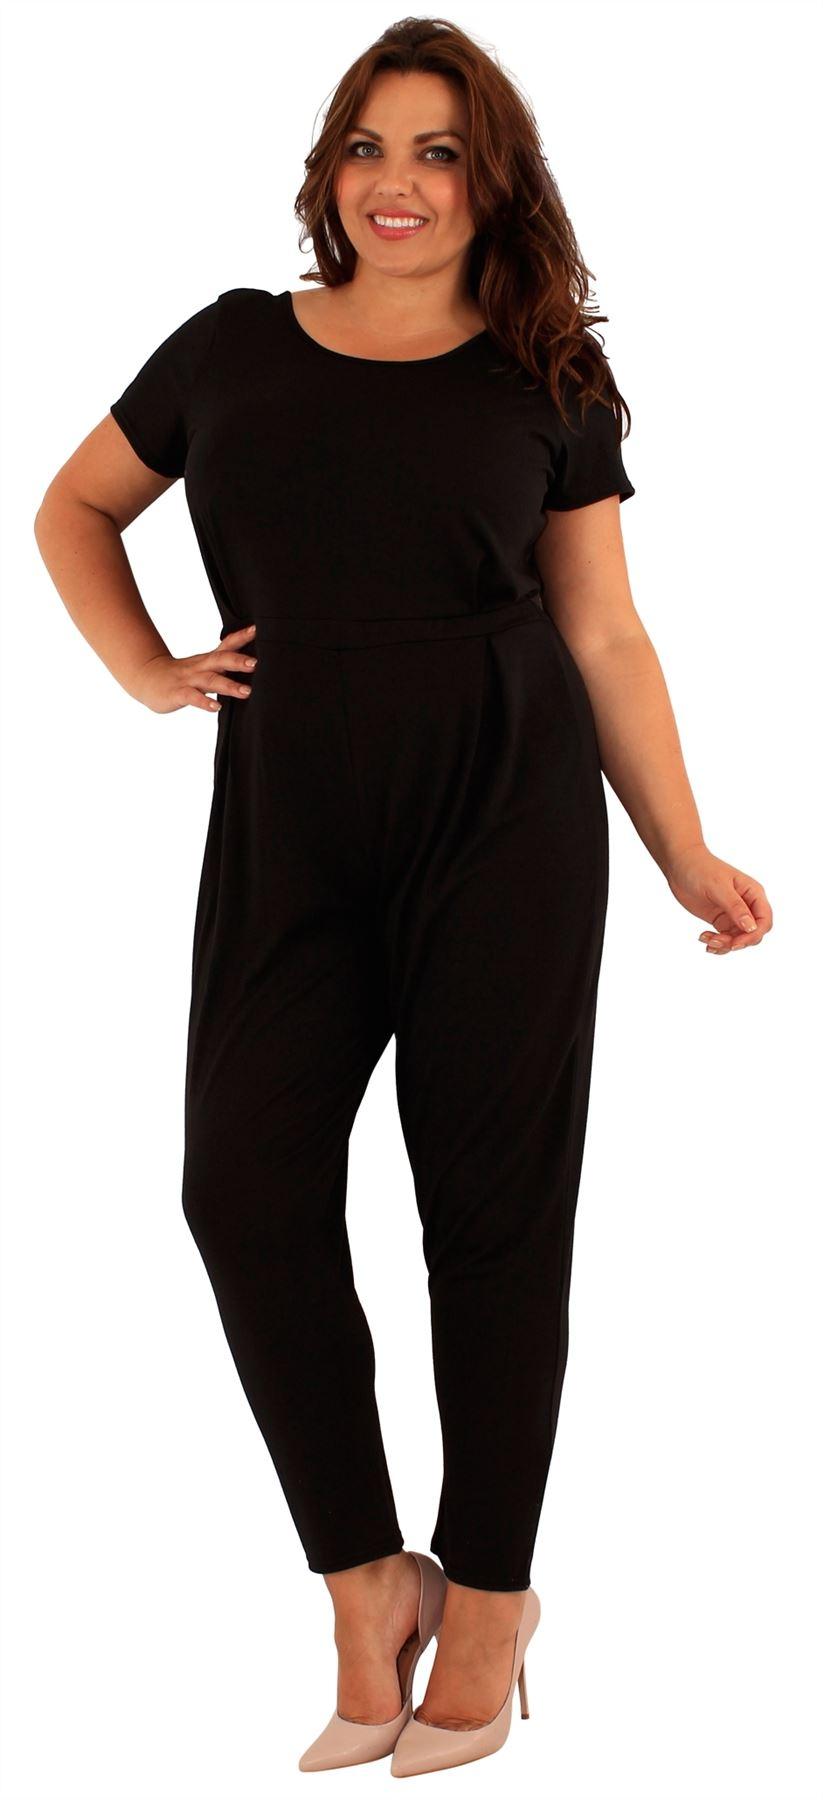 new womens plus size short sleeve one piece jumpsuit dress. Black Bedroom Furniture Sets. Home Design Ideas